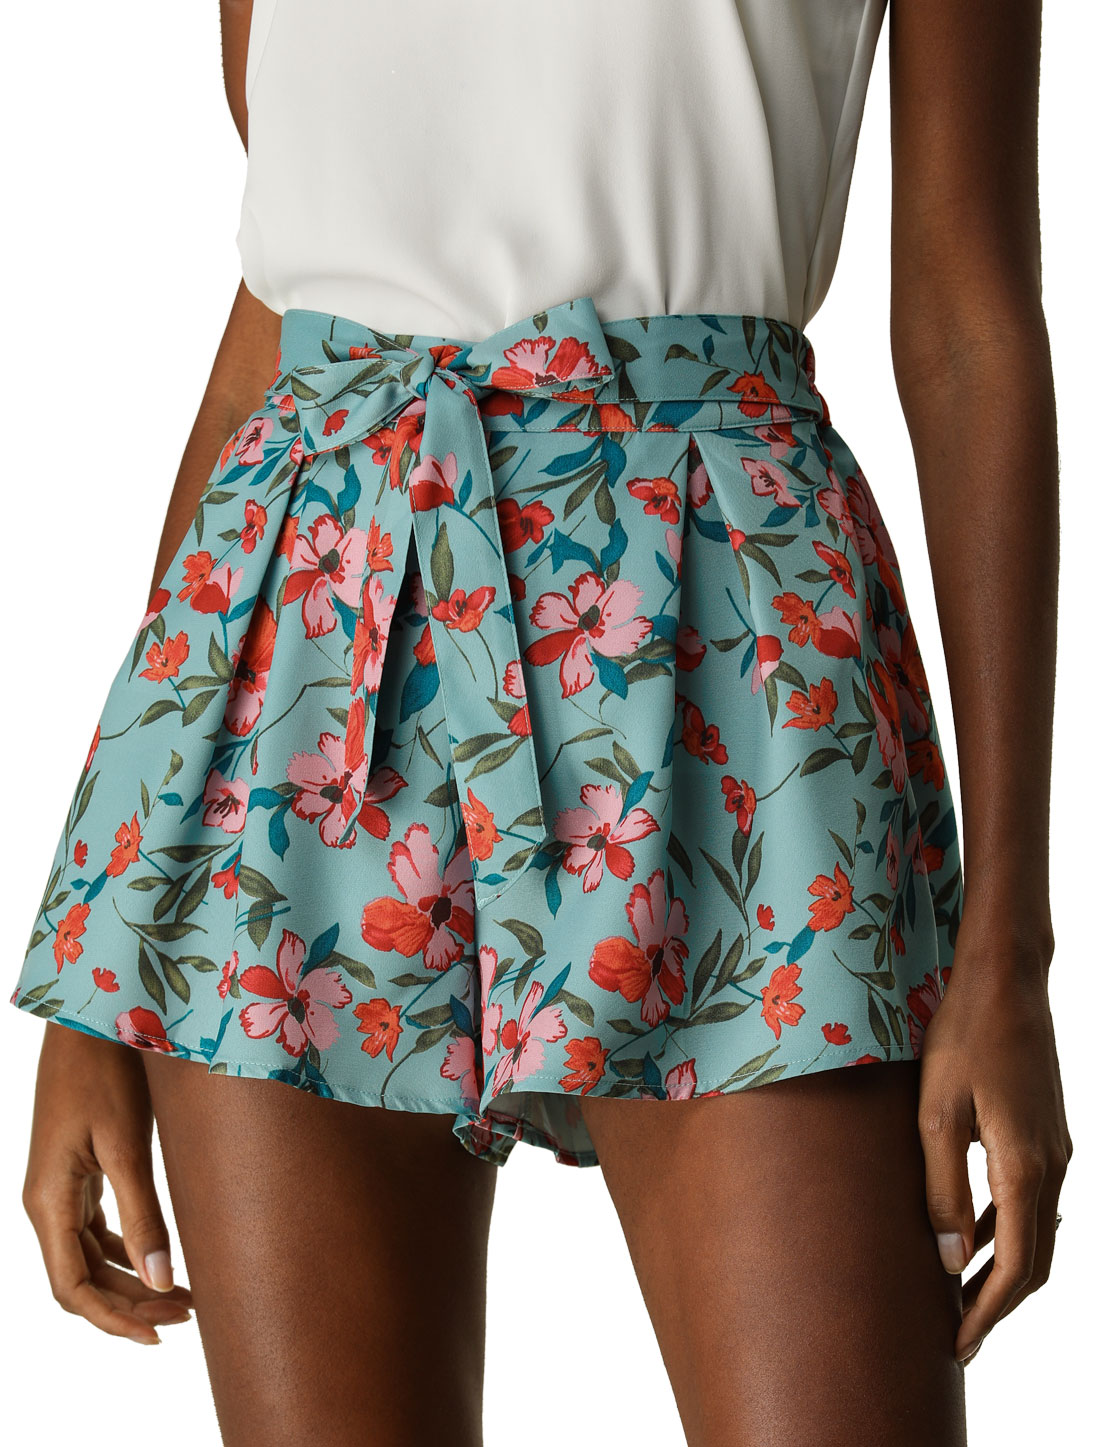 Women Elastic Waist Floral Print Summer Boho Beach Shorts Blue Green XS